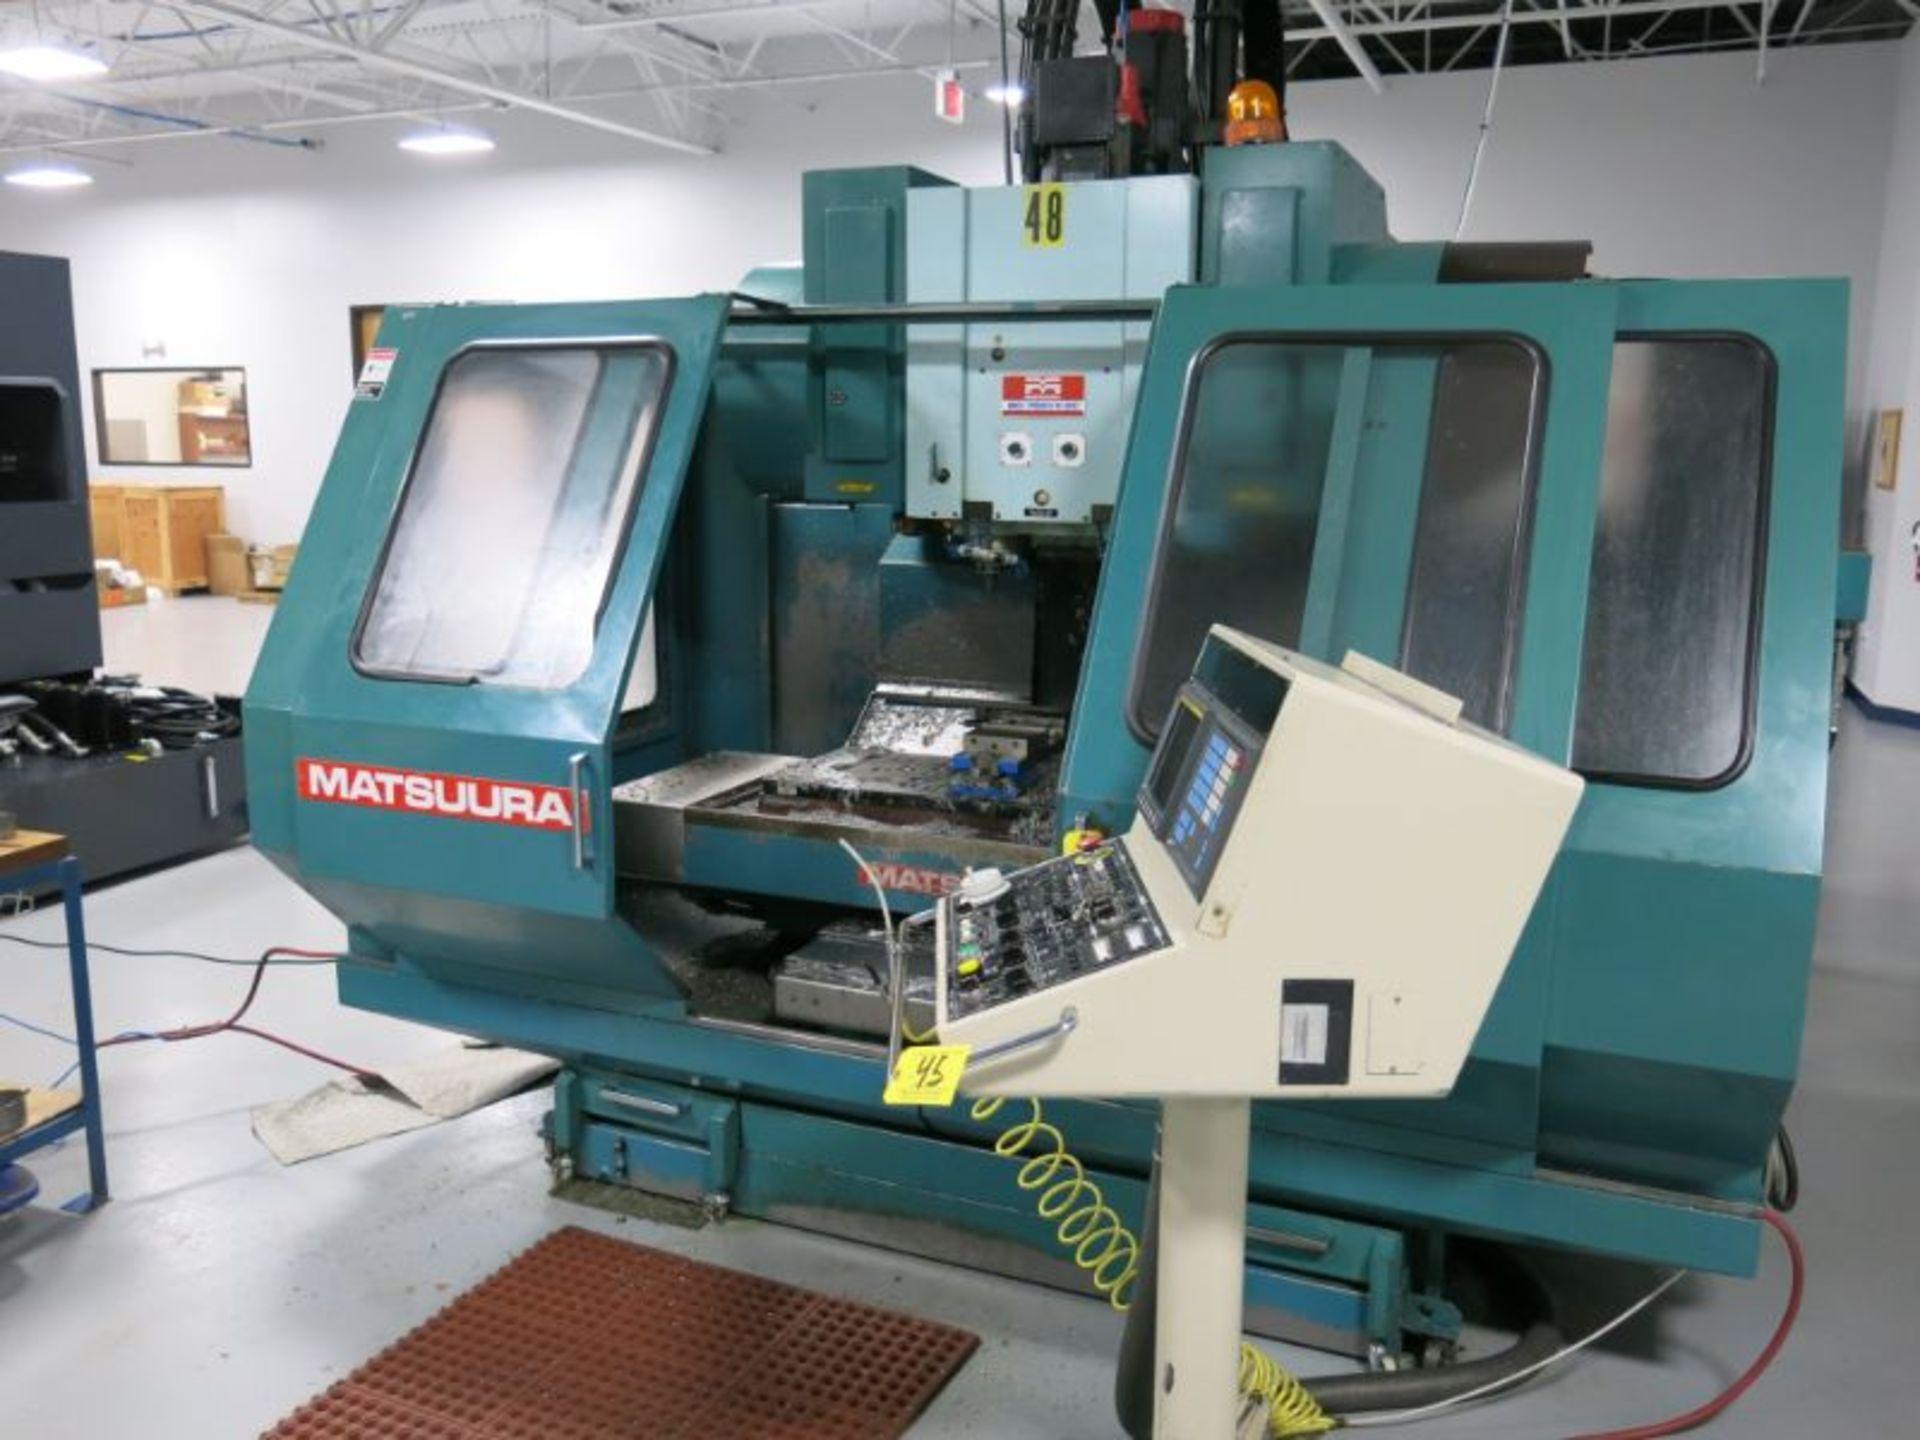 1991 Matsuura MC-760VX-DC Twin Spindle CNC VMC - Image 2 of 5